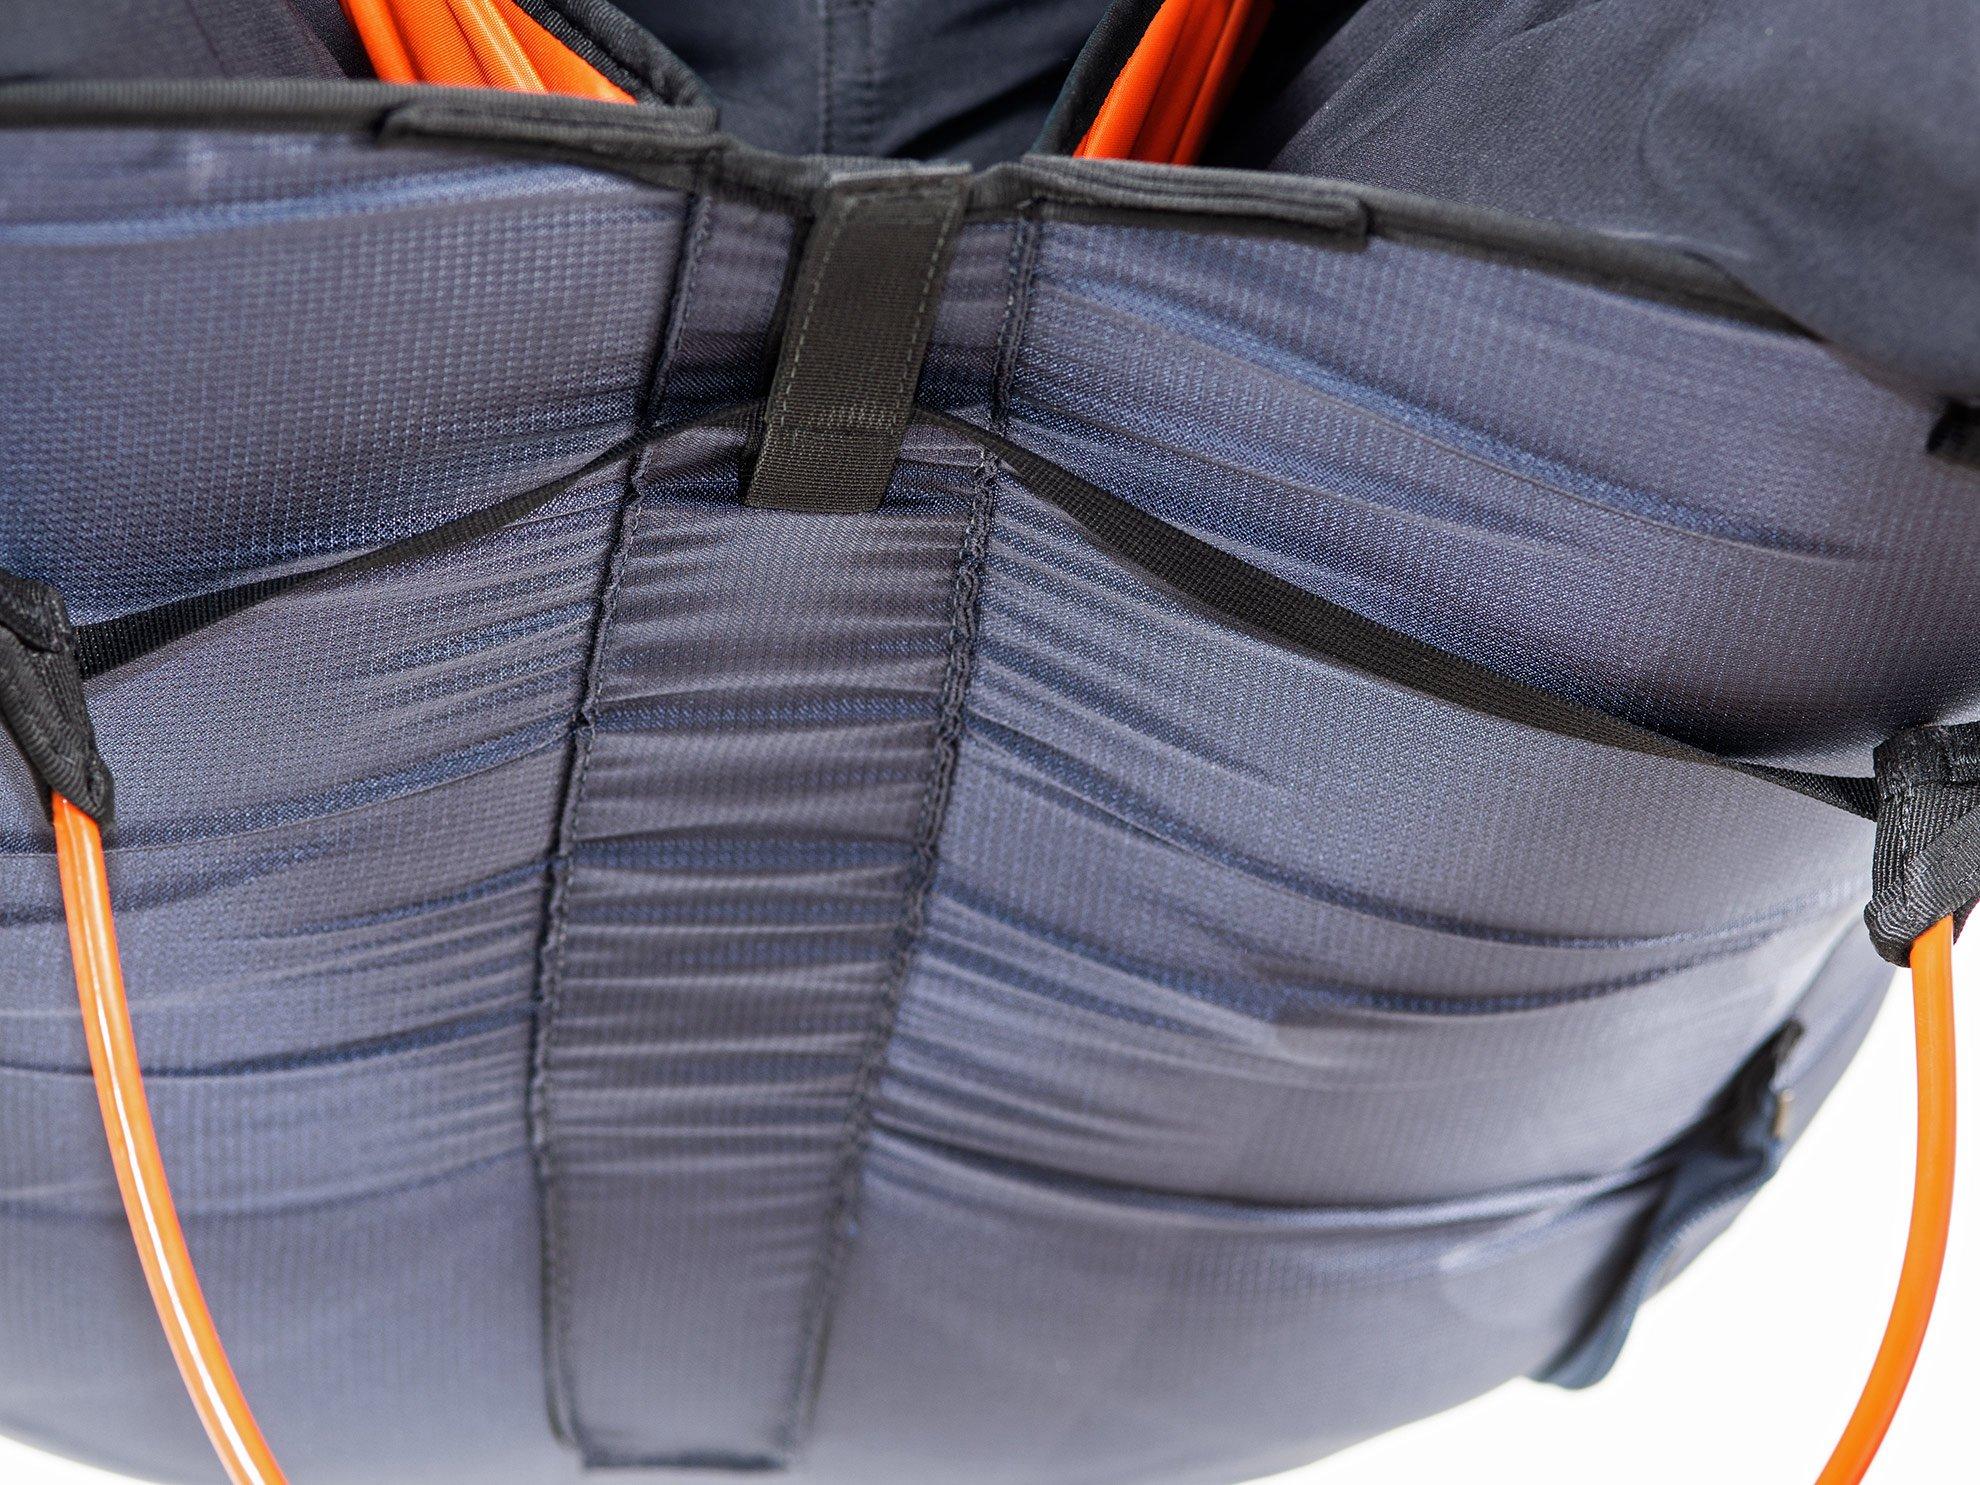 Gurtzeug Check Sitzbrett / Fussbrett Beinsack